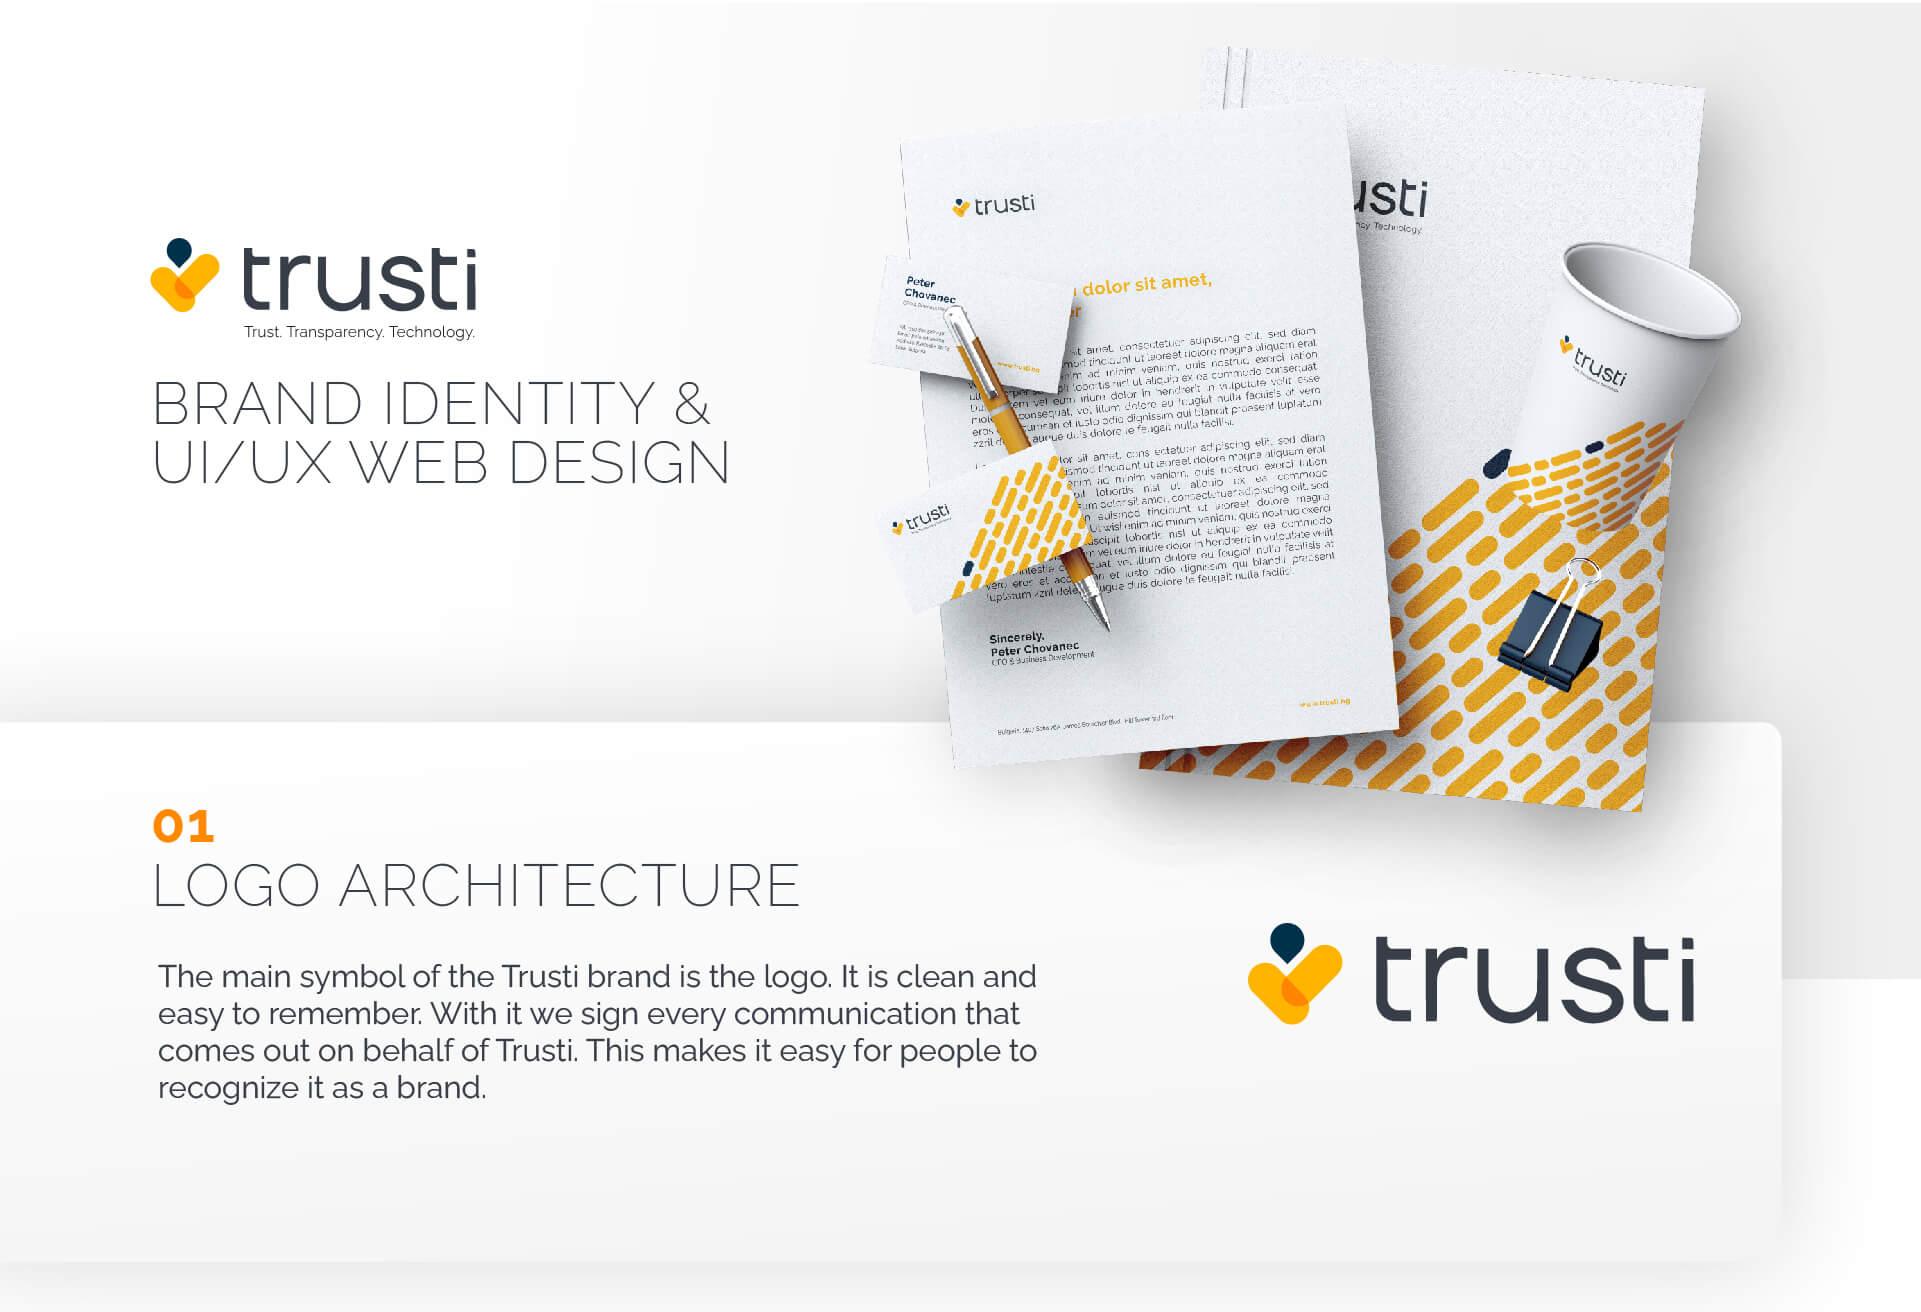 trusti_presentation-01